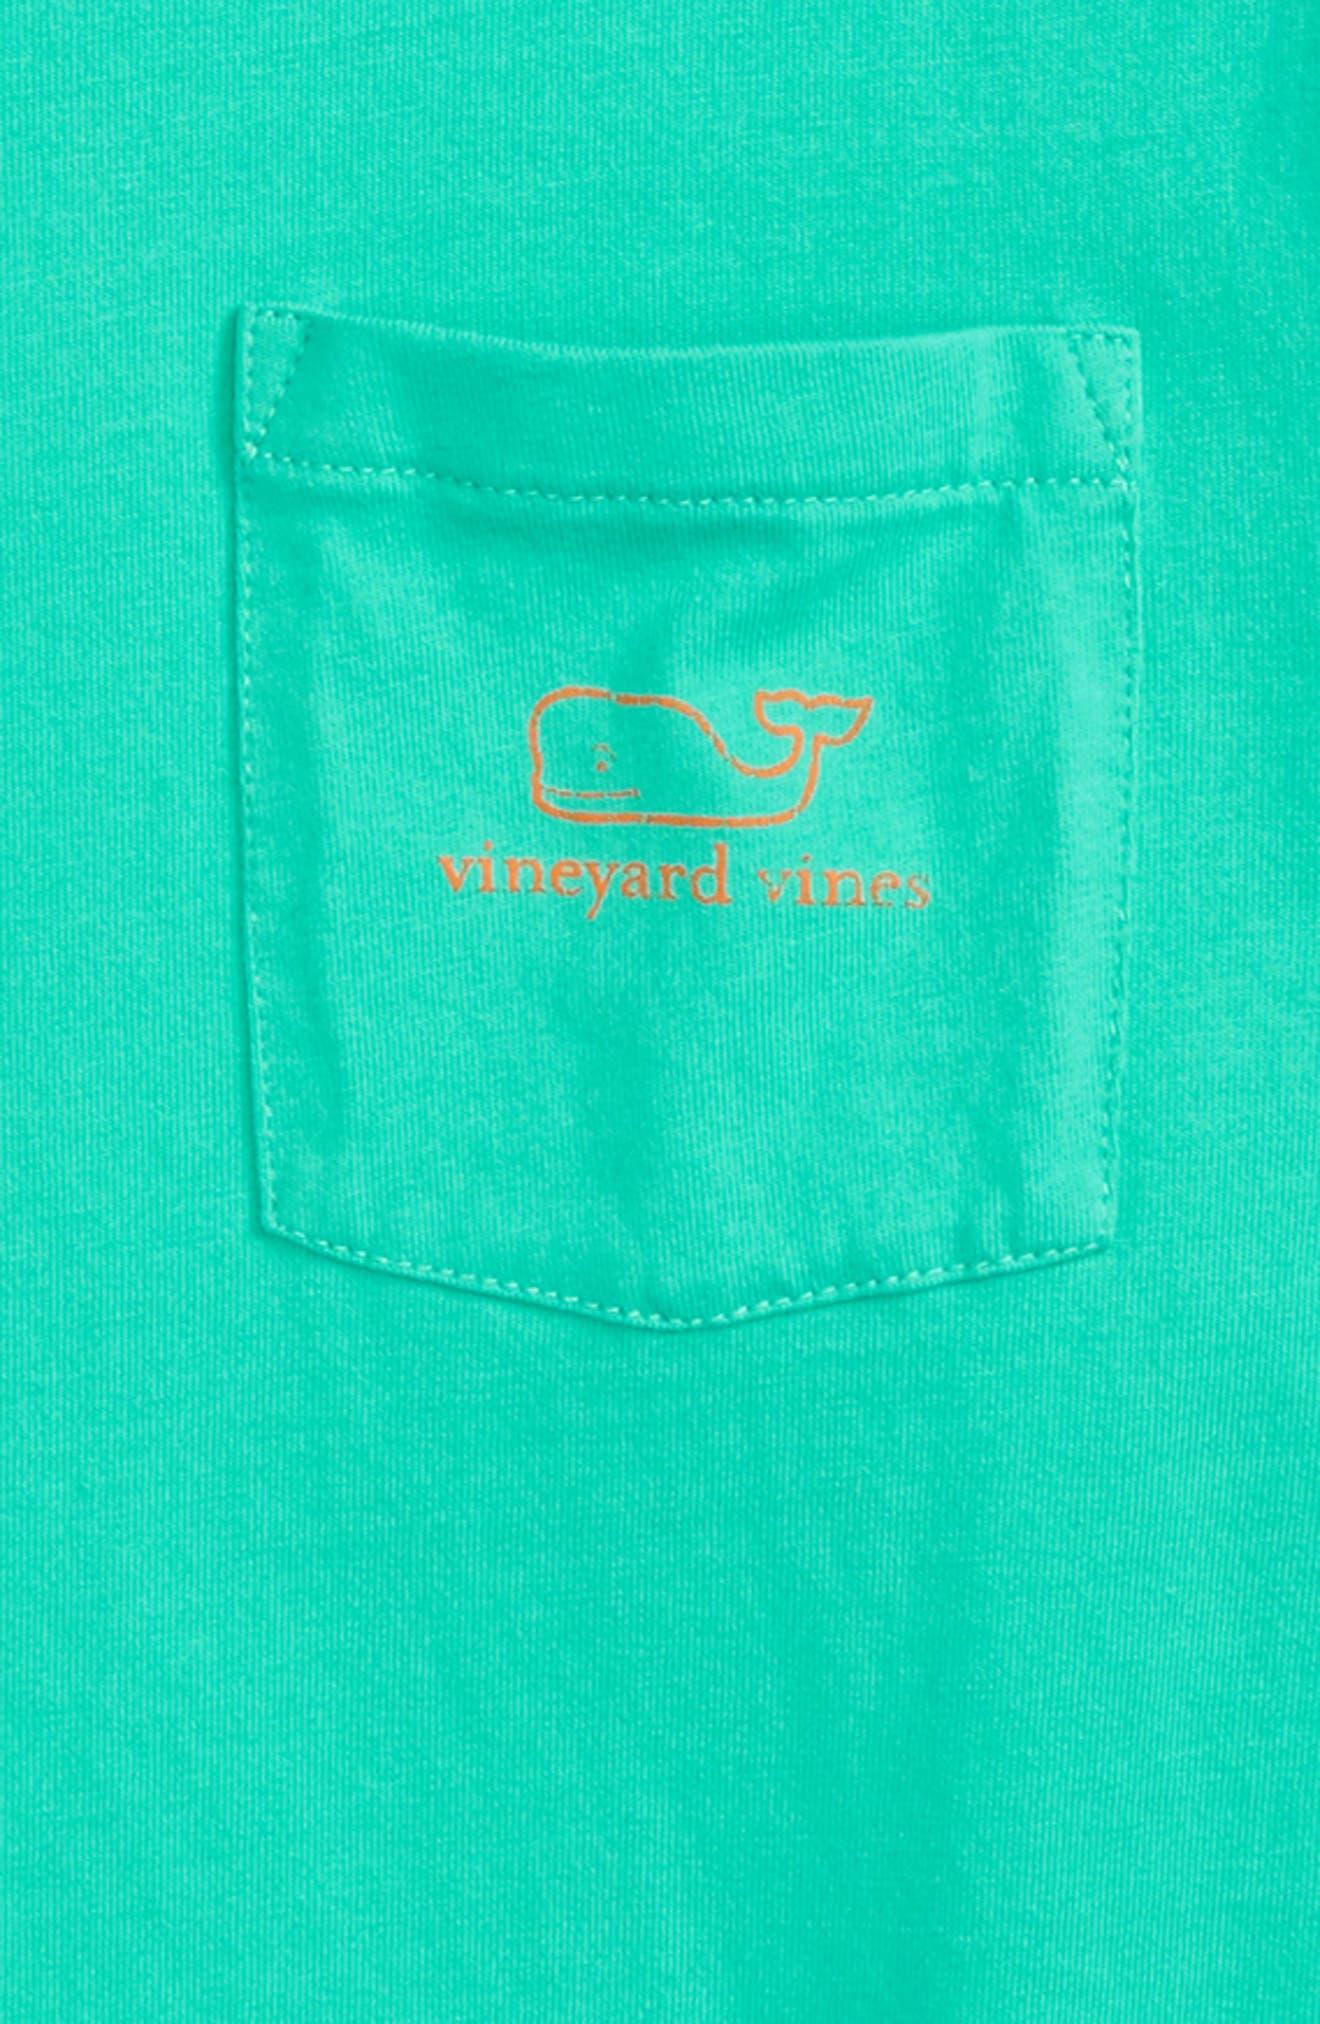 Vintage Whale Graphic Long Sleeve T-Shirt,                             Alternate thumbnail 3, color,                             386